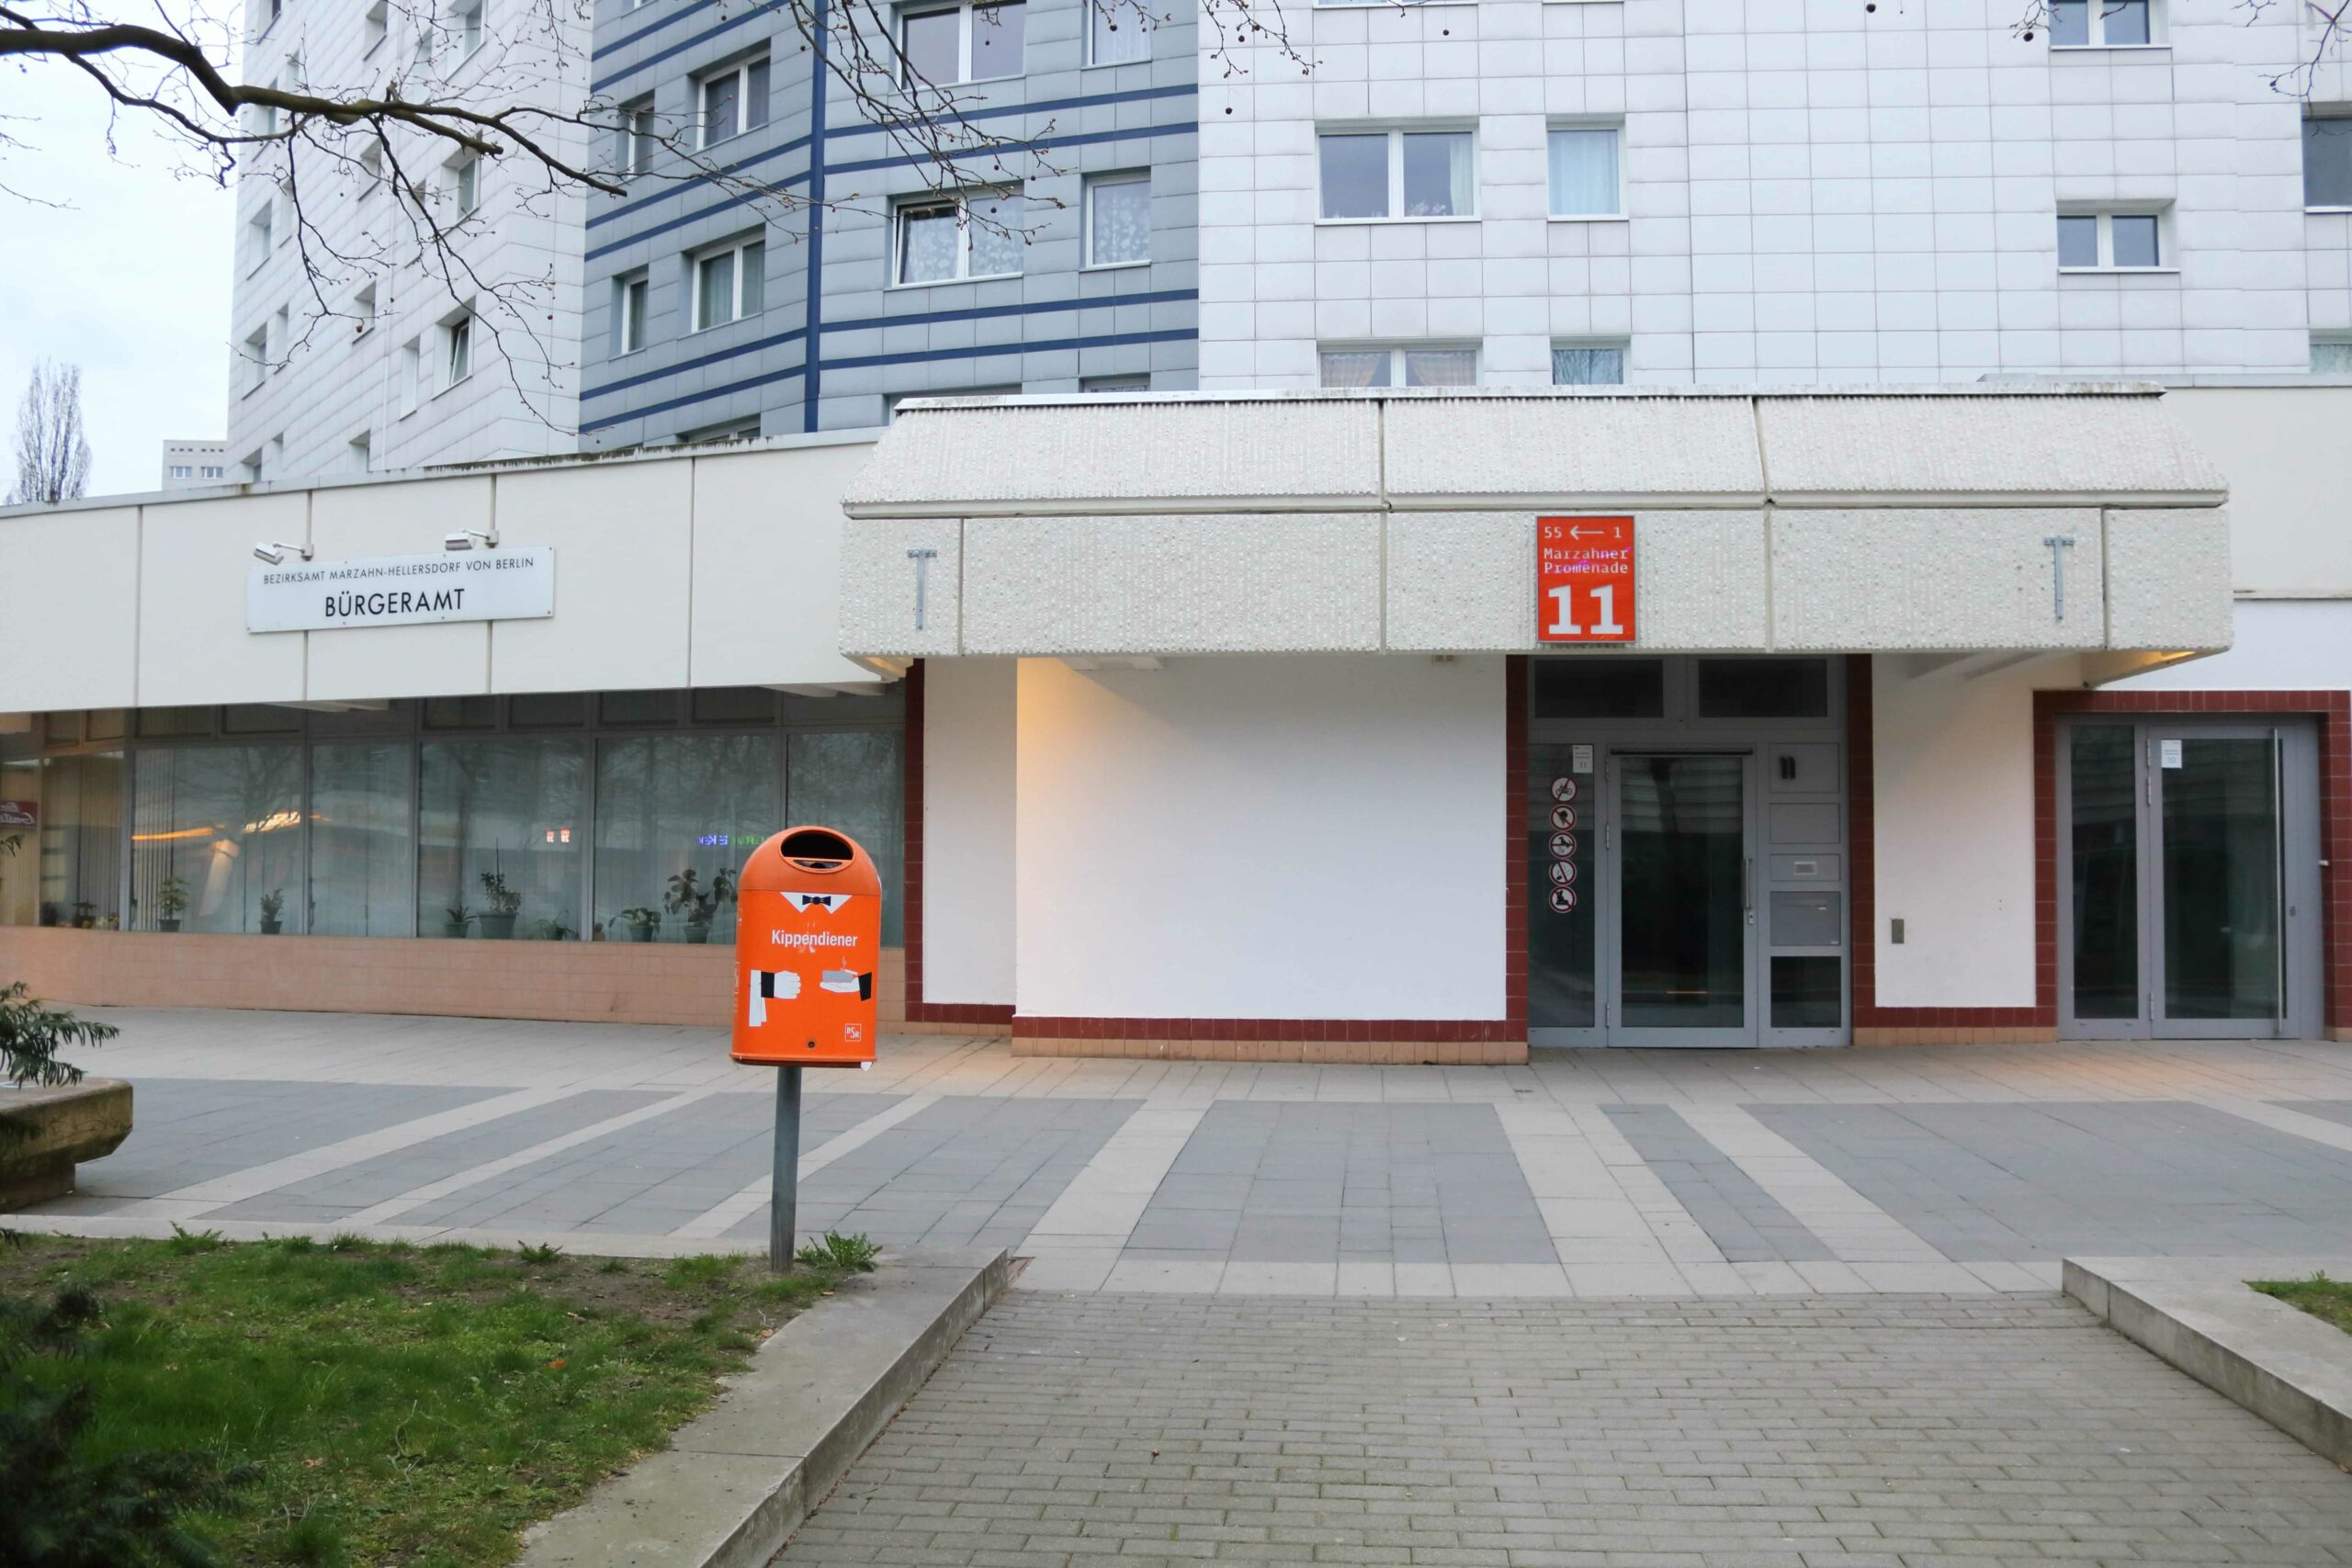 Bürgeramt Marzahner Promenade 11